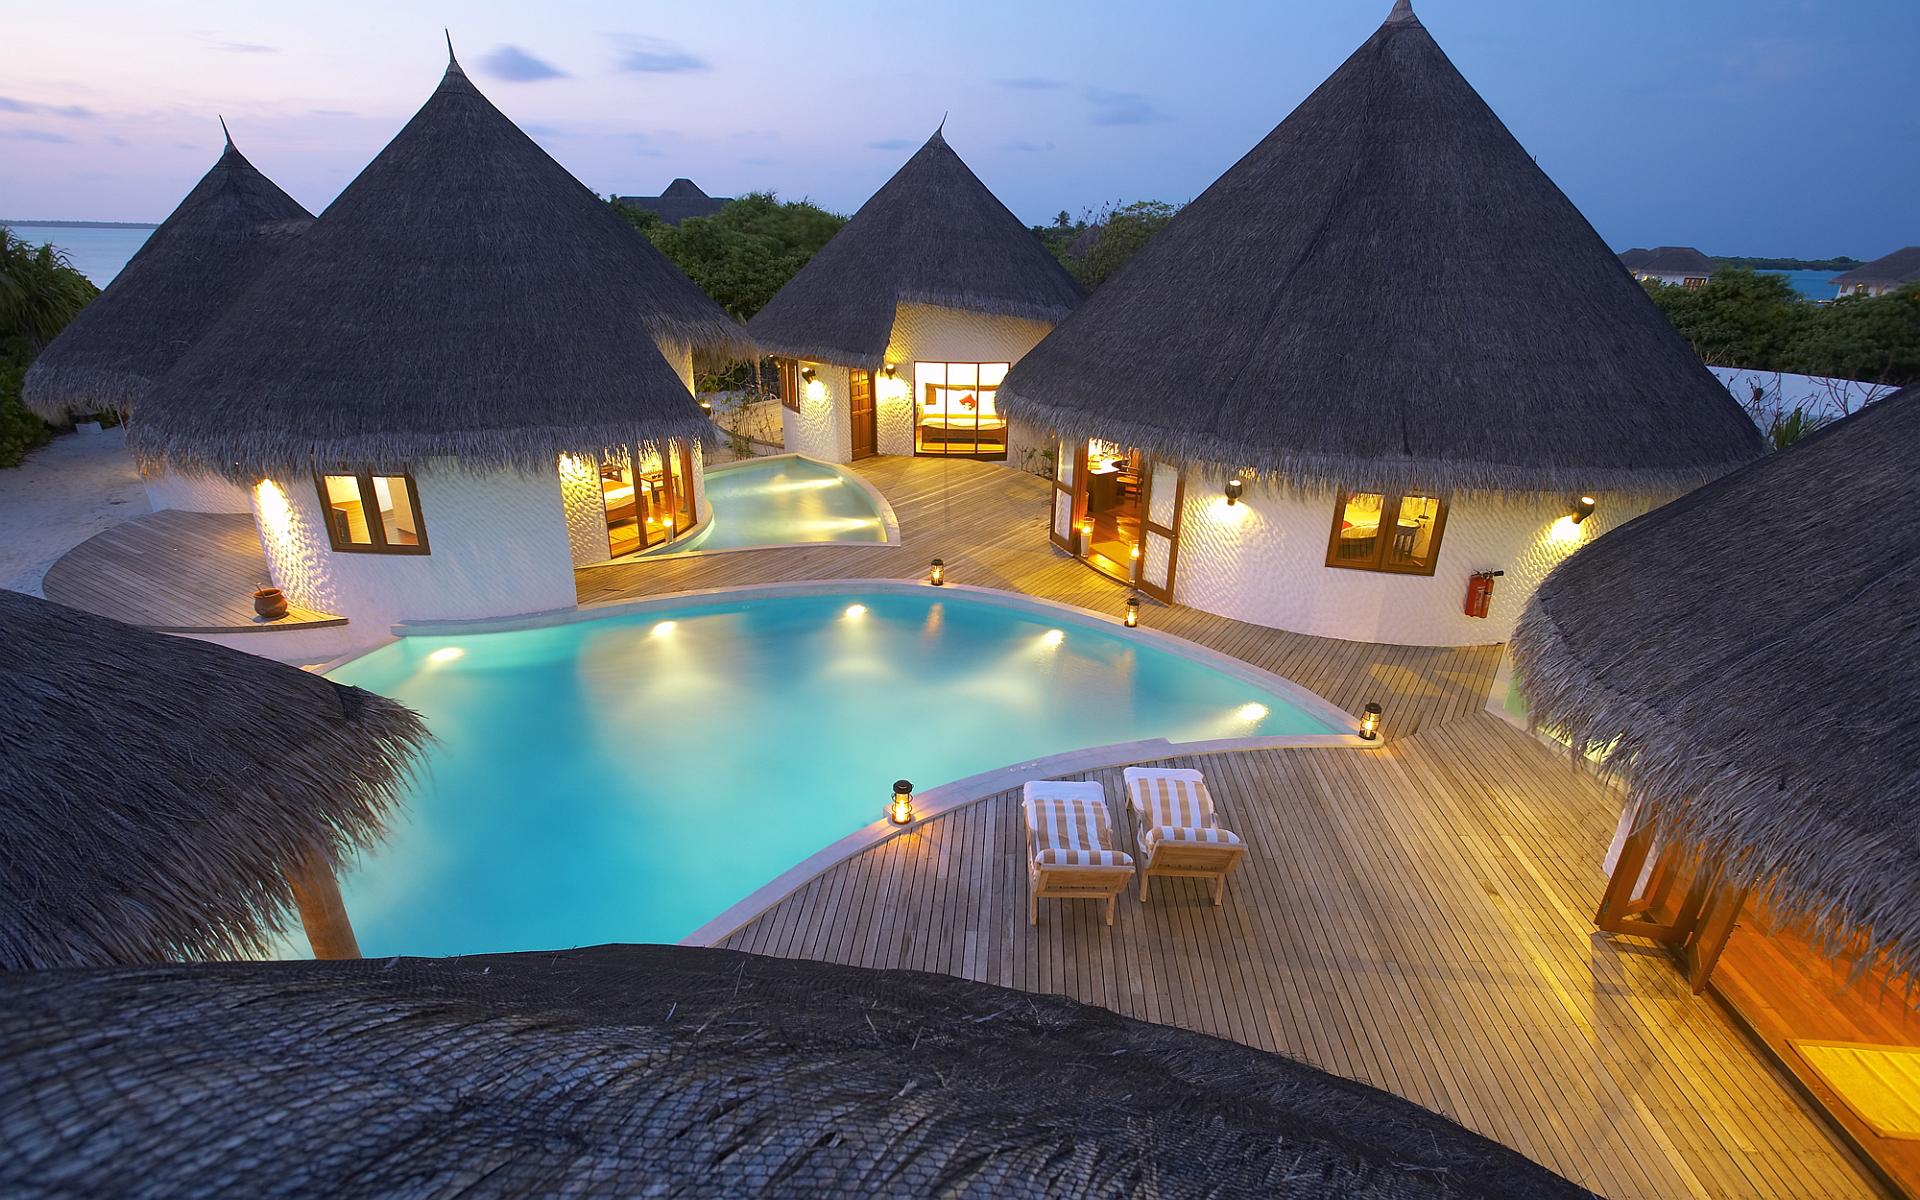 ... Maldives Islands luxury-resort-maldives ...